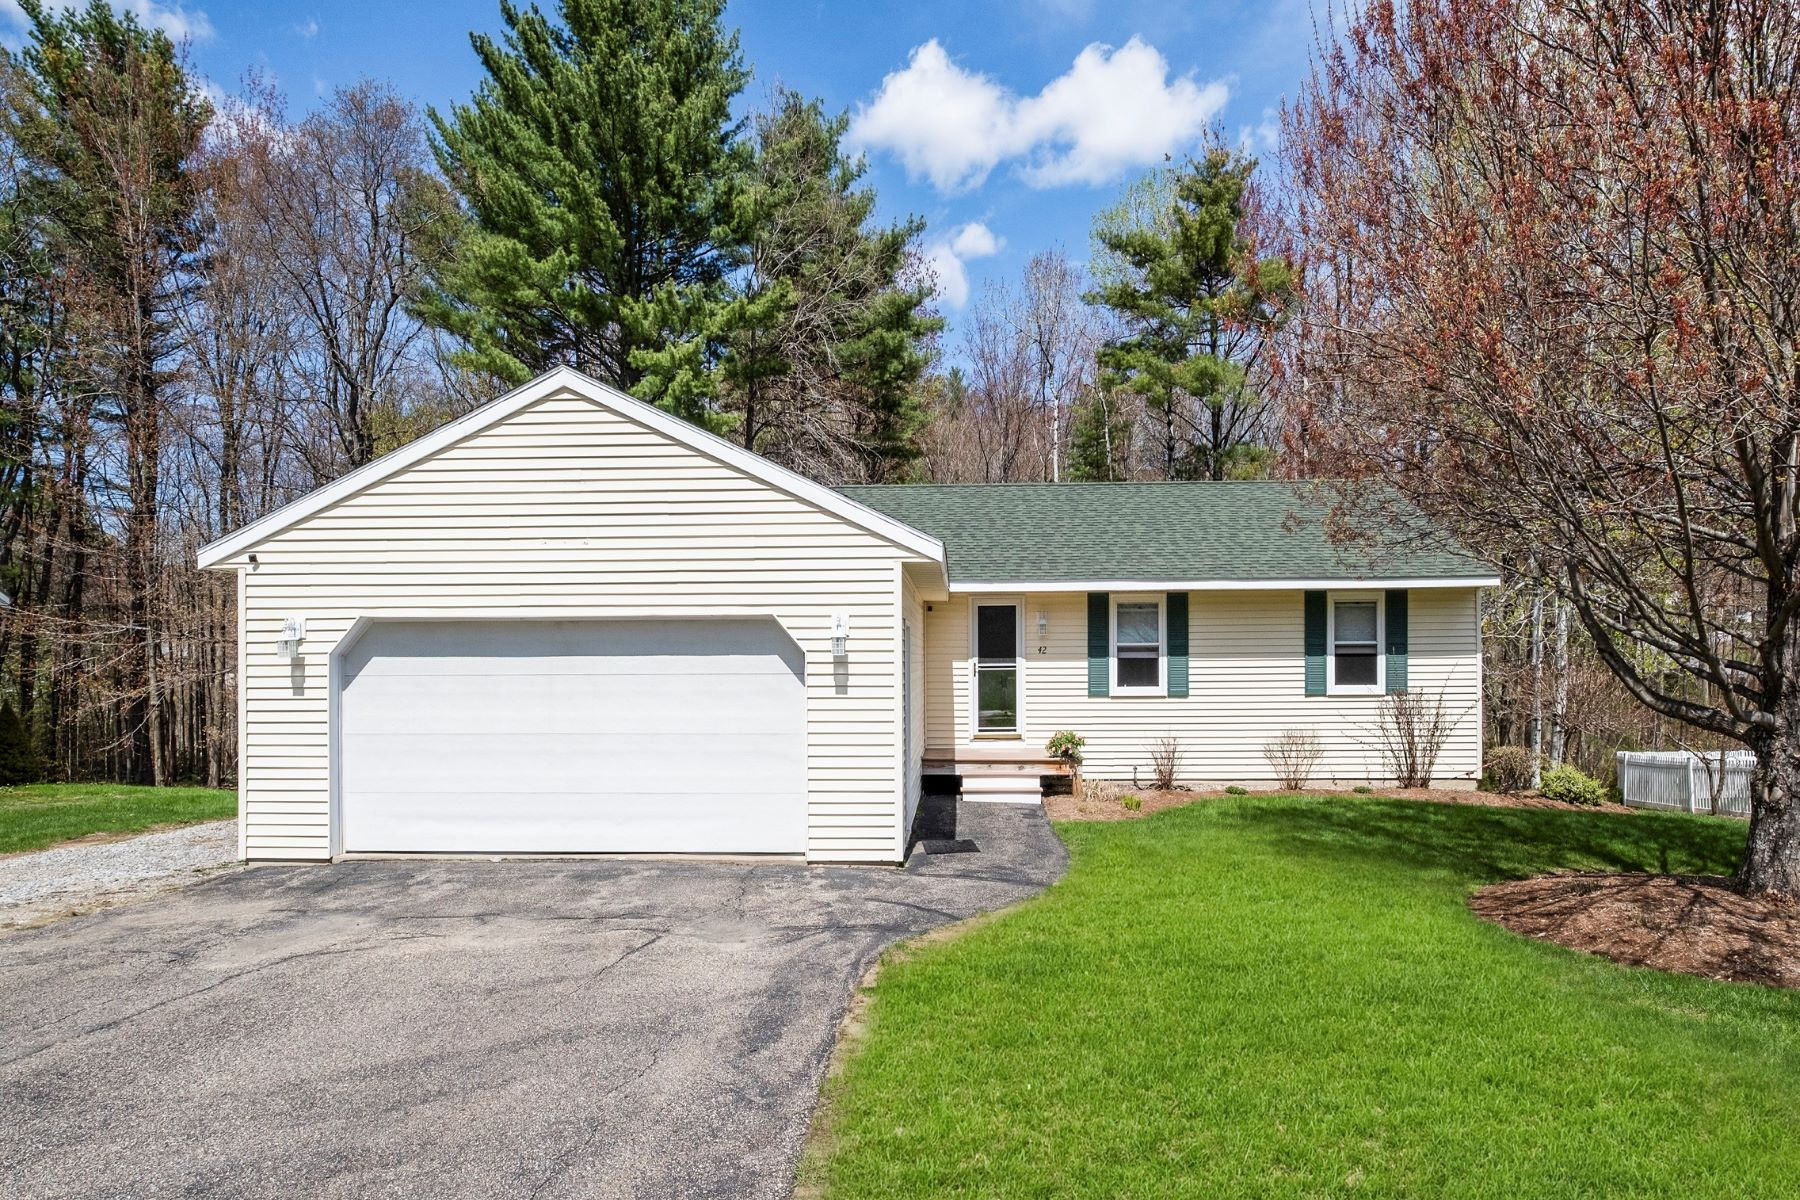 Single Family Homes 为 销售 在 42 Emerald Drive, Laconia 42 Emerald Dr 拉科尼亚, 新罕布什尔州 03246 美国